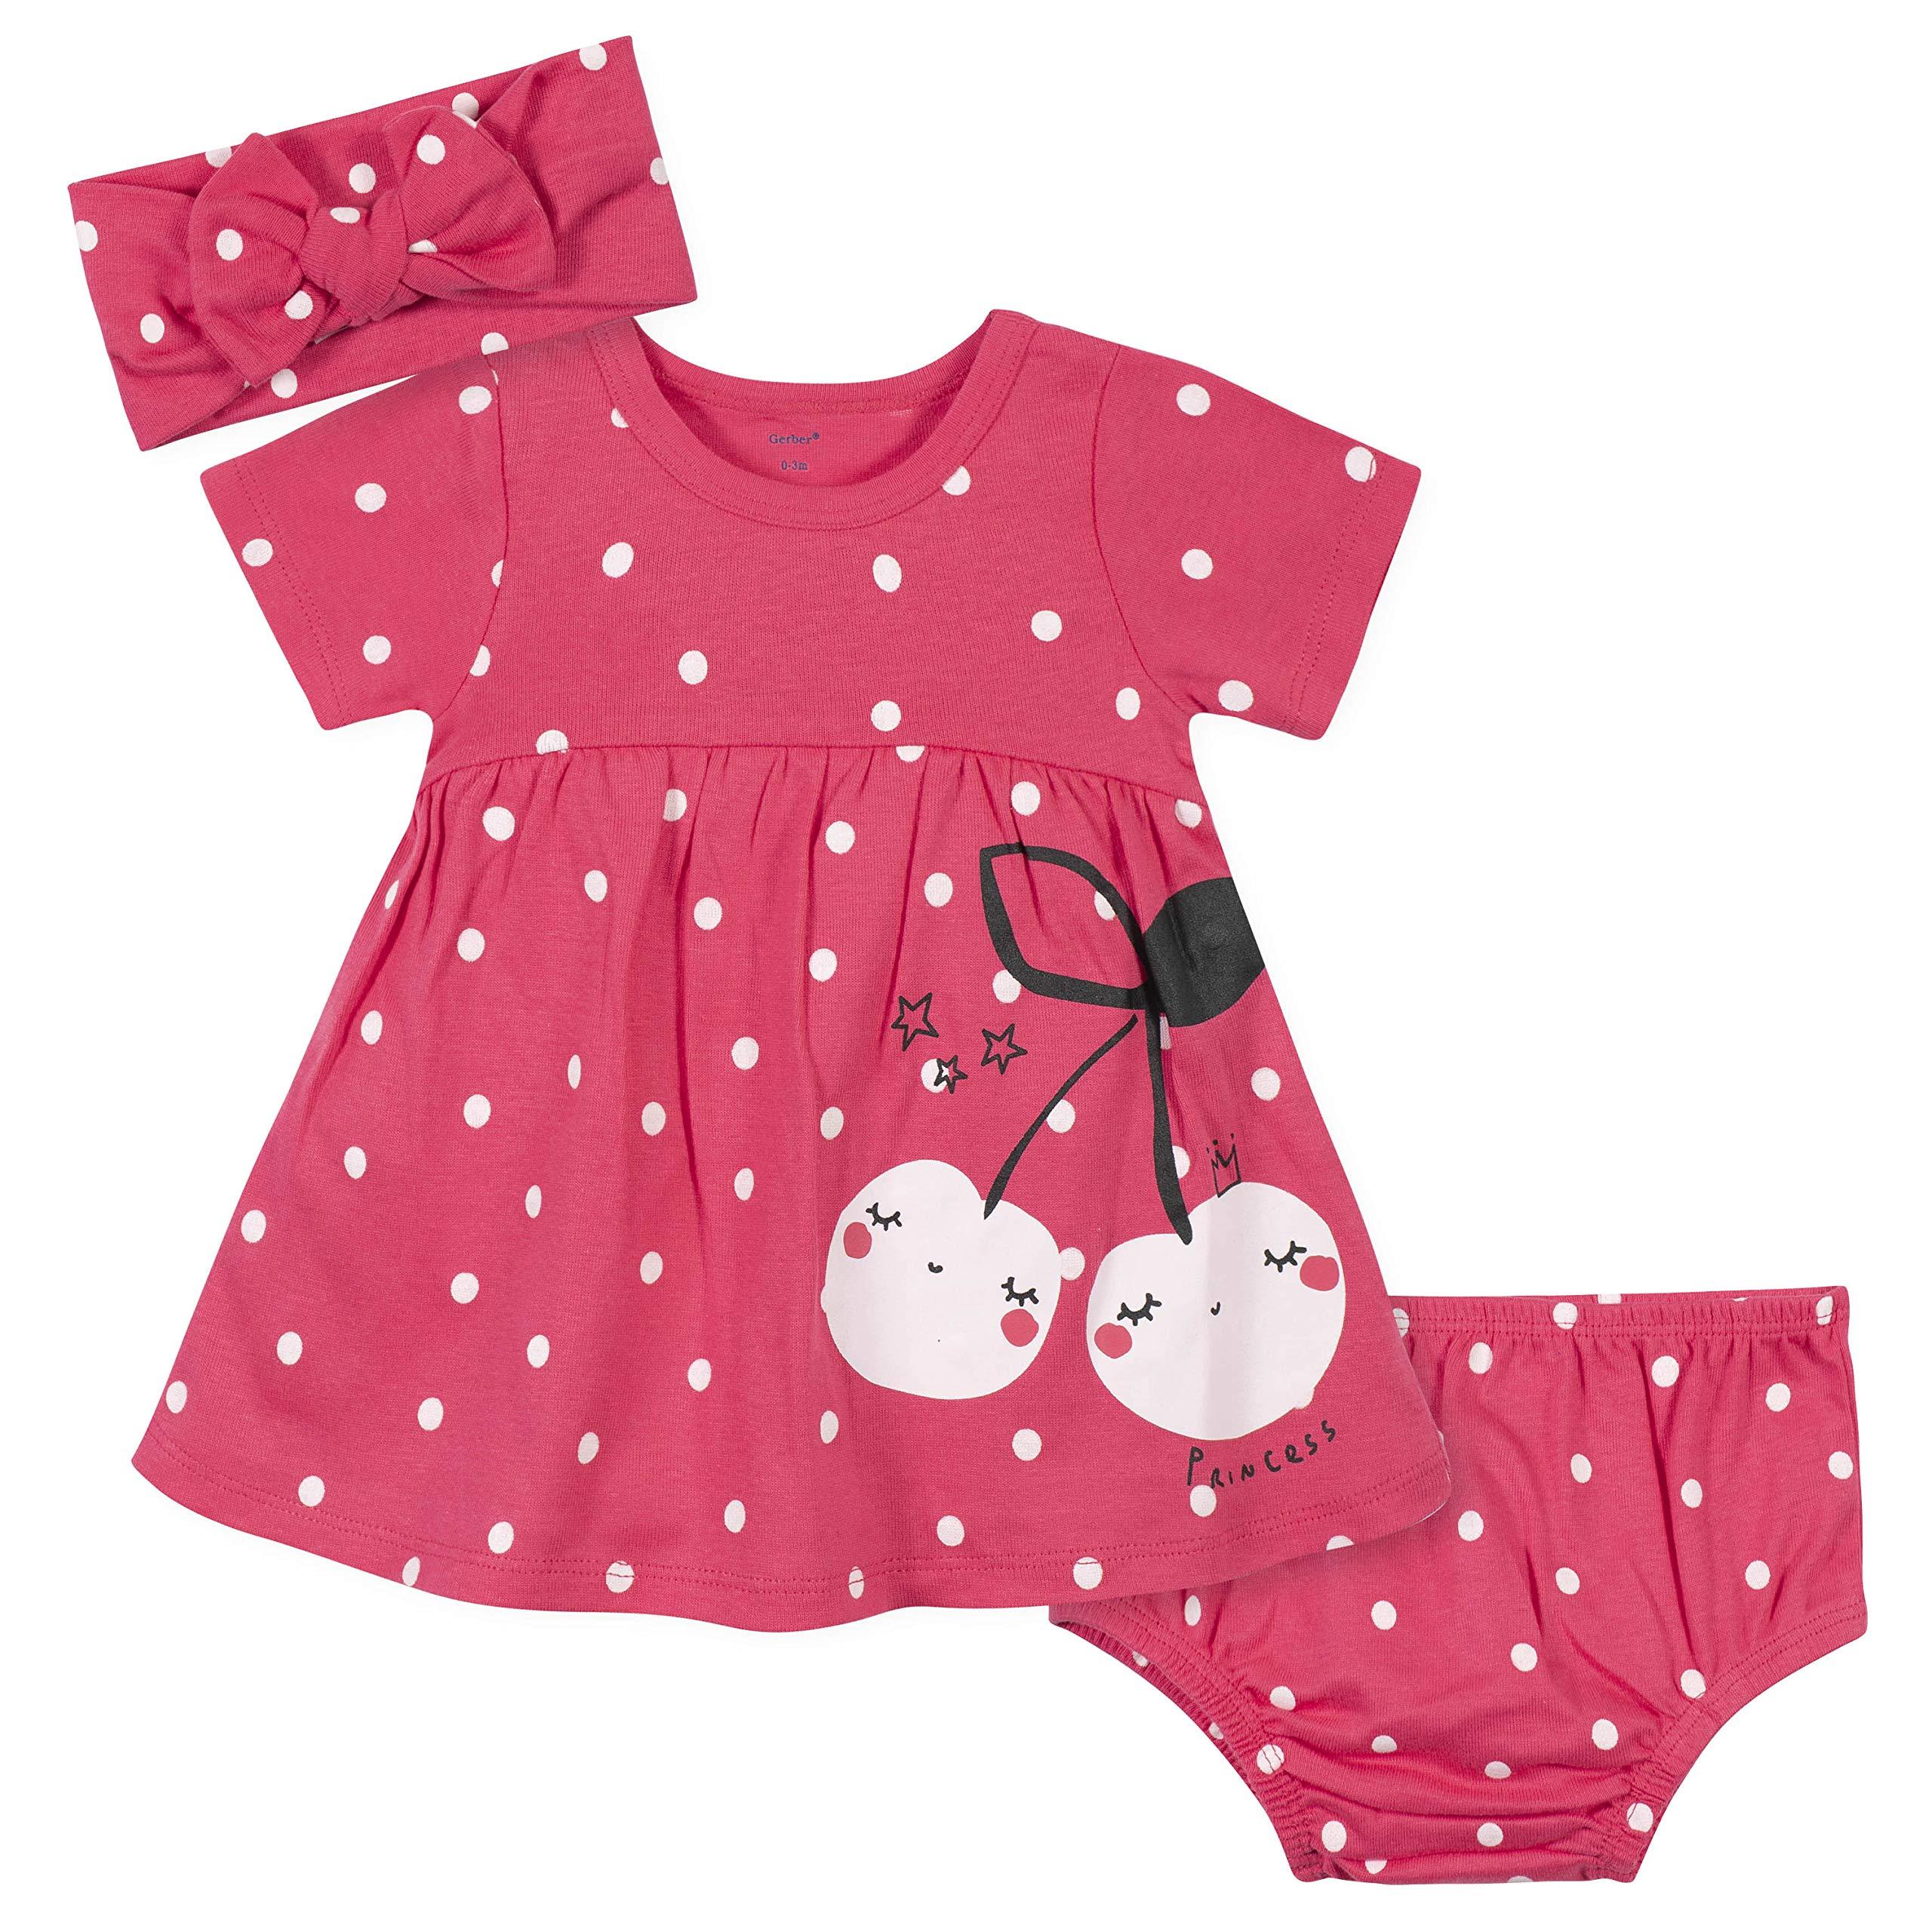 Gerber Baby Girls' 3-Piece Dress, Diaper Cover and Headband Set